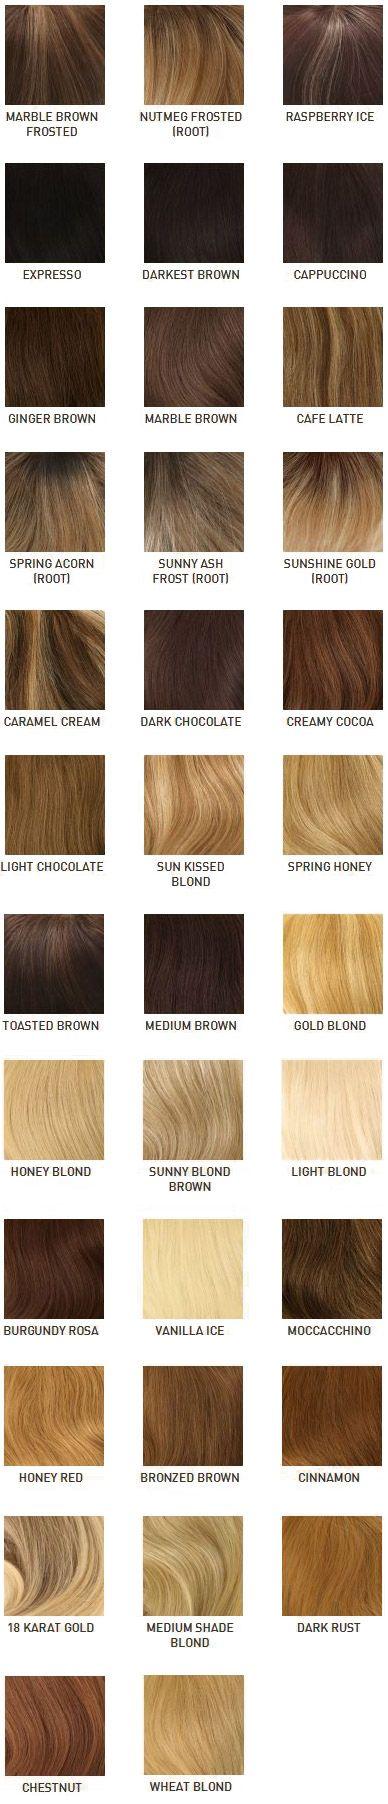 Human Hair Color Inheritance Chart Google Search Human Hair Color Hair Color Hair Color Chart